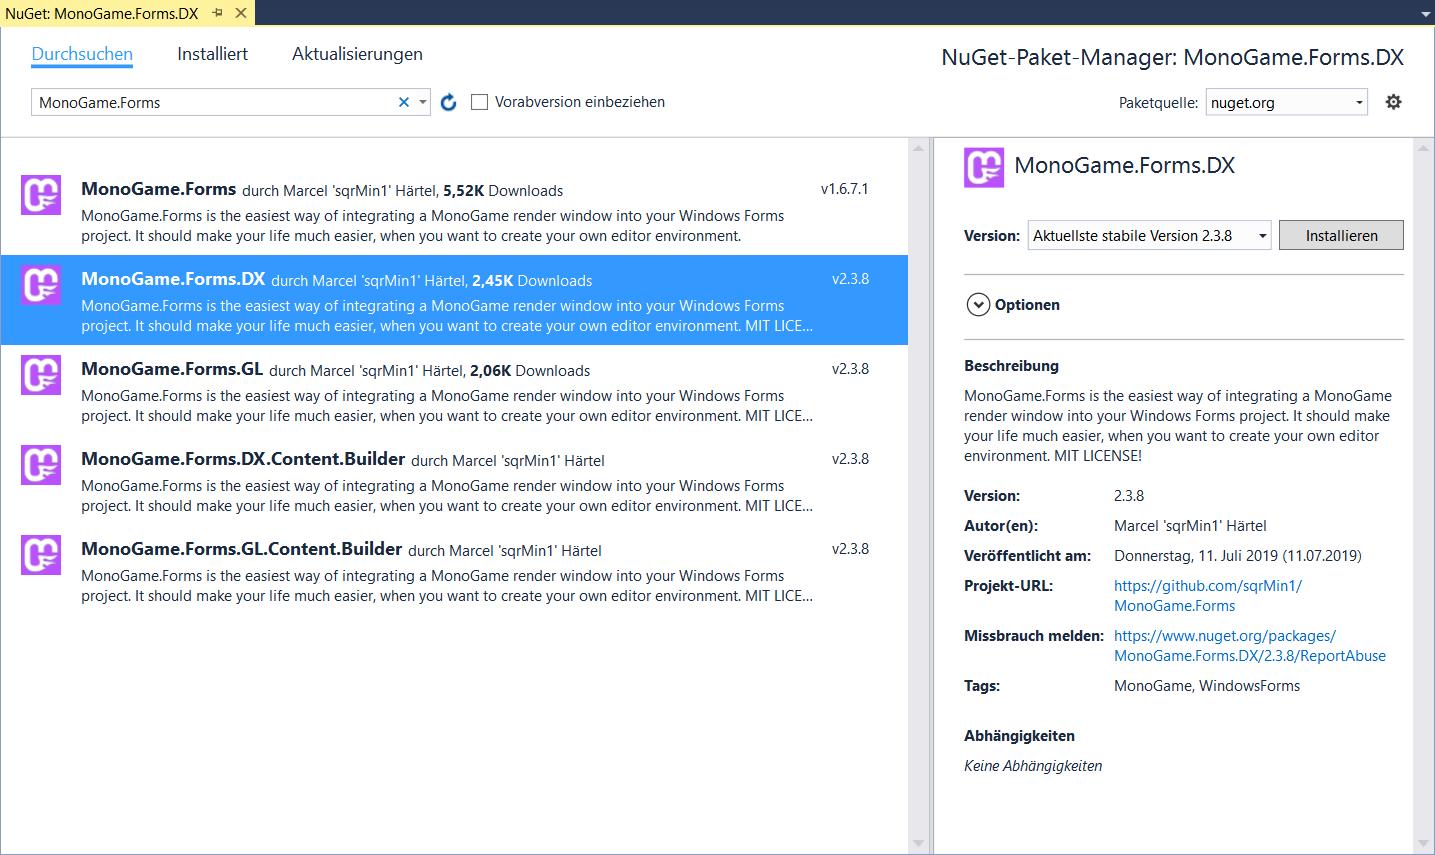 MonoGame Forms - Create your Editor Environment! - Showcase